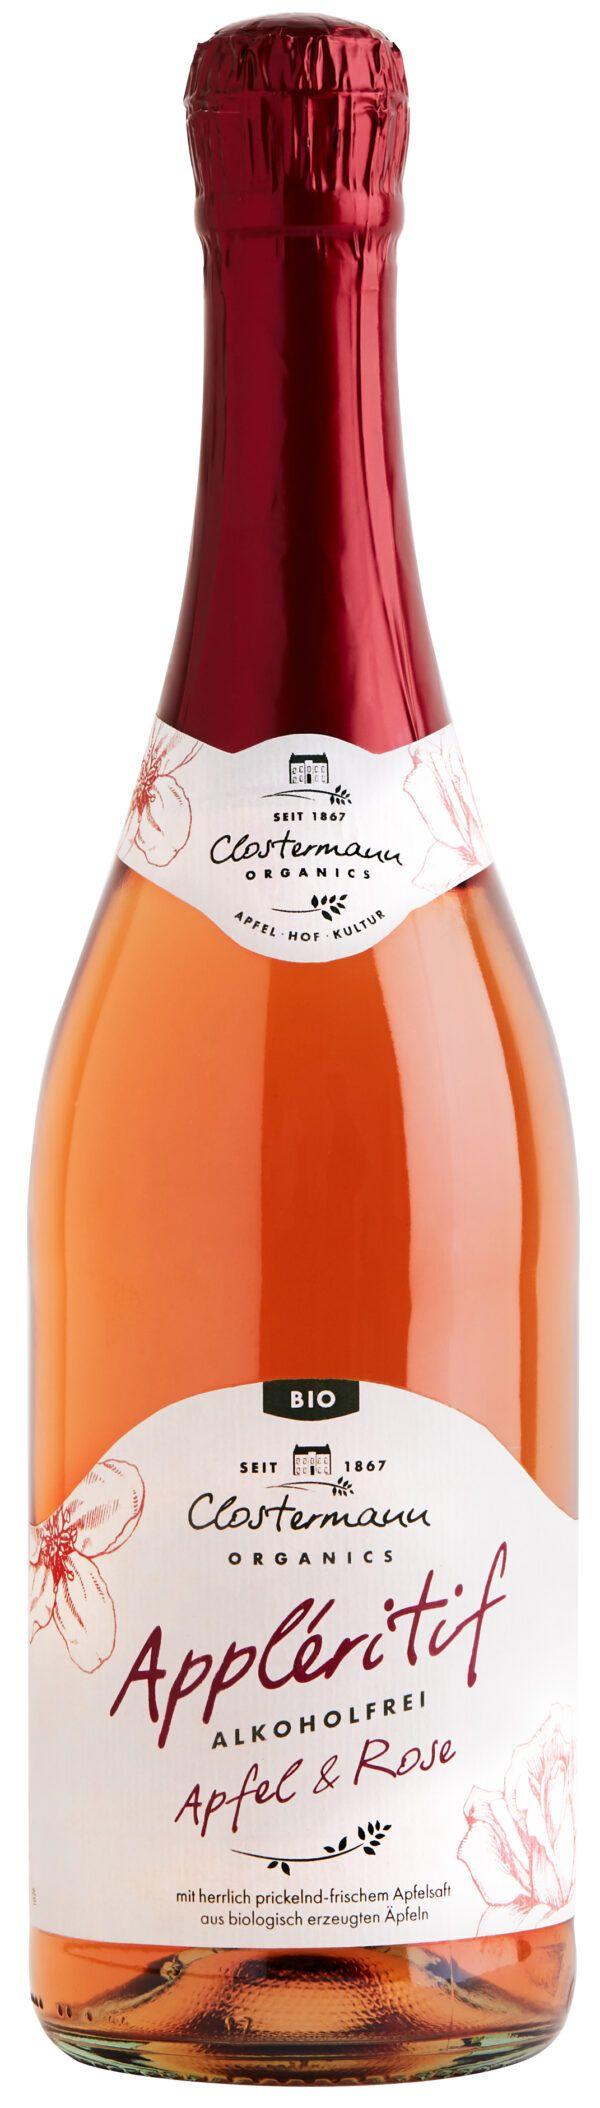 Clostermann Appleritif Apfel & Rose (alkoholfrei) 0,75l